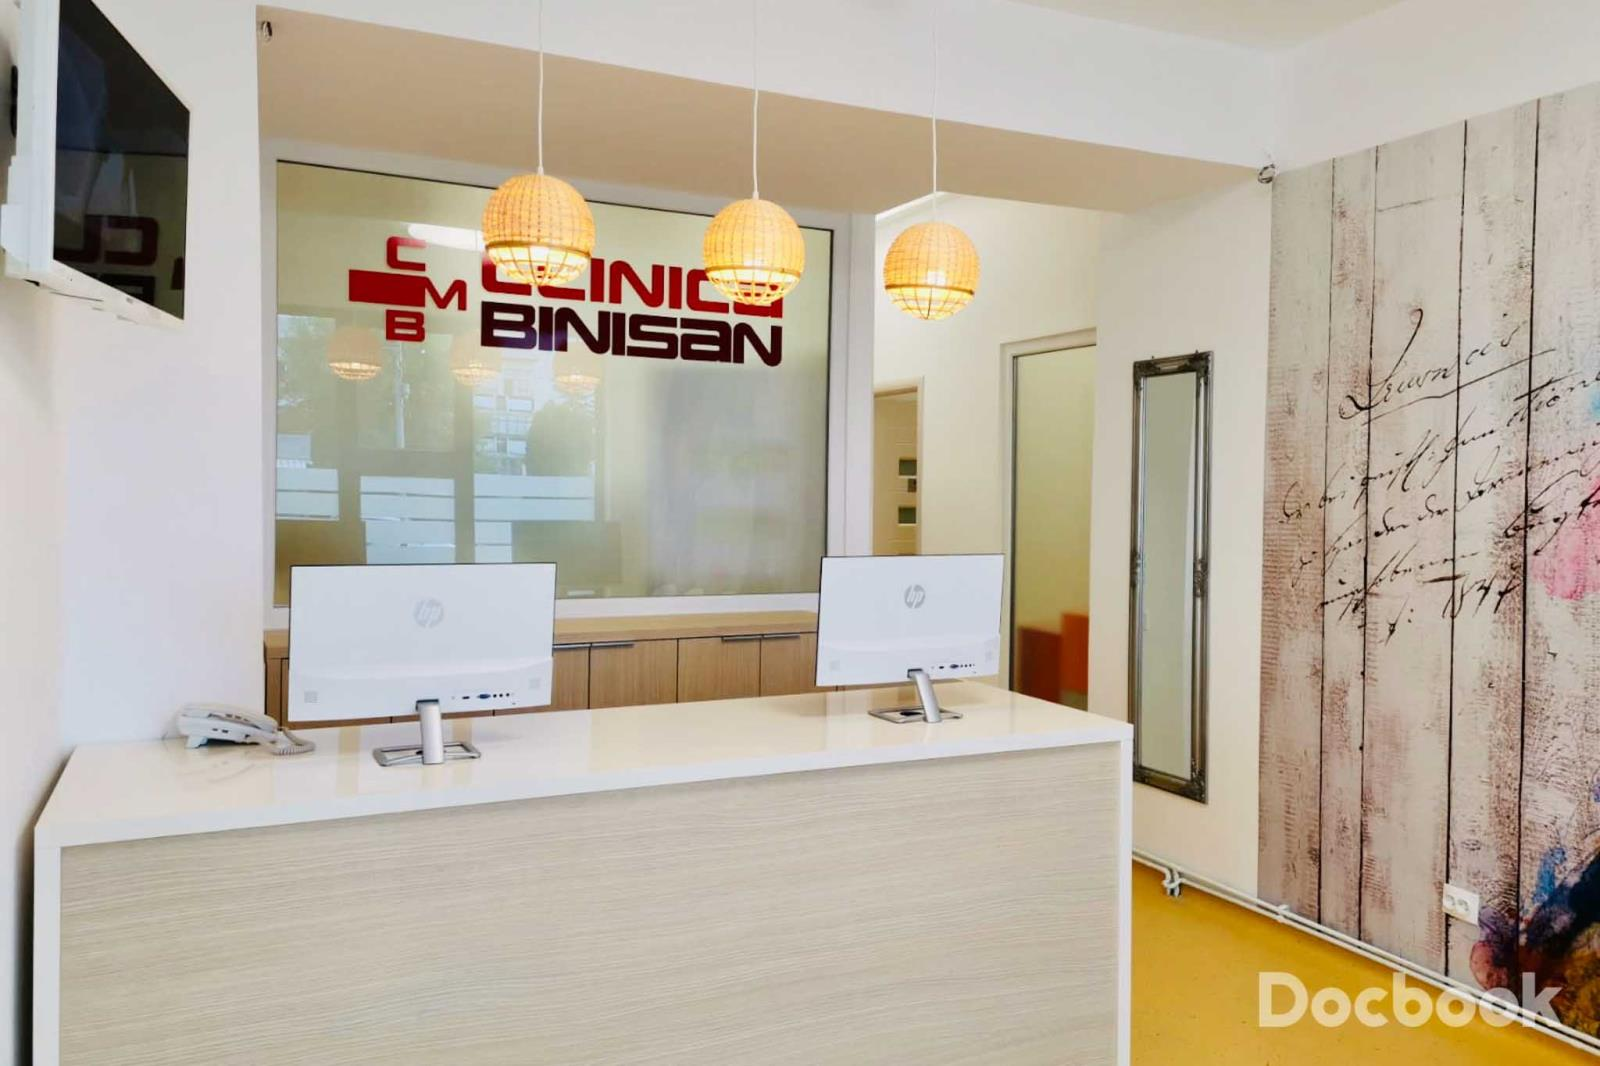 Clinica Binisan - Curtea de Arges